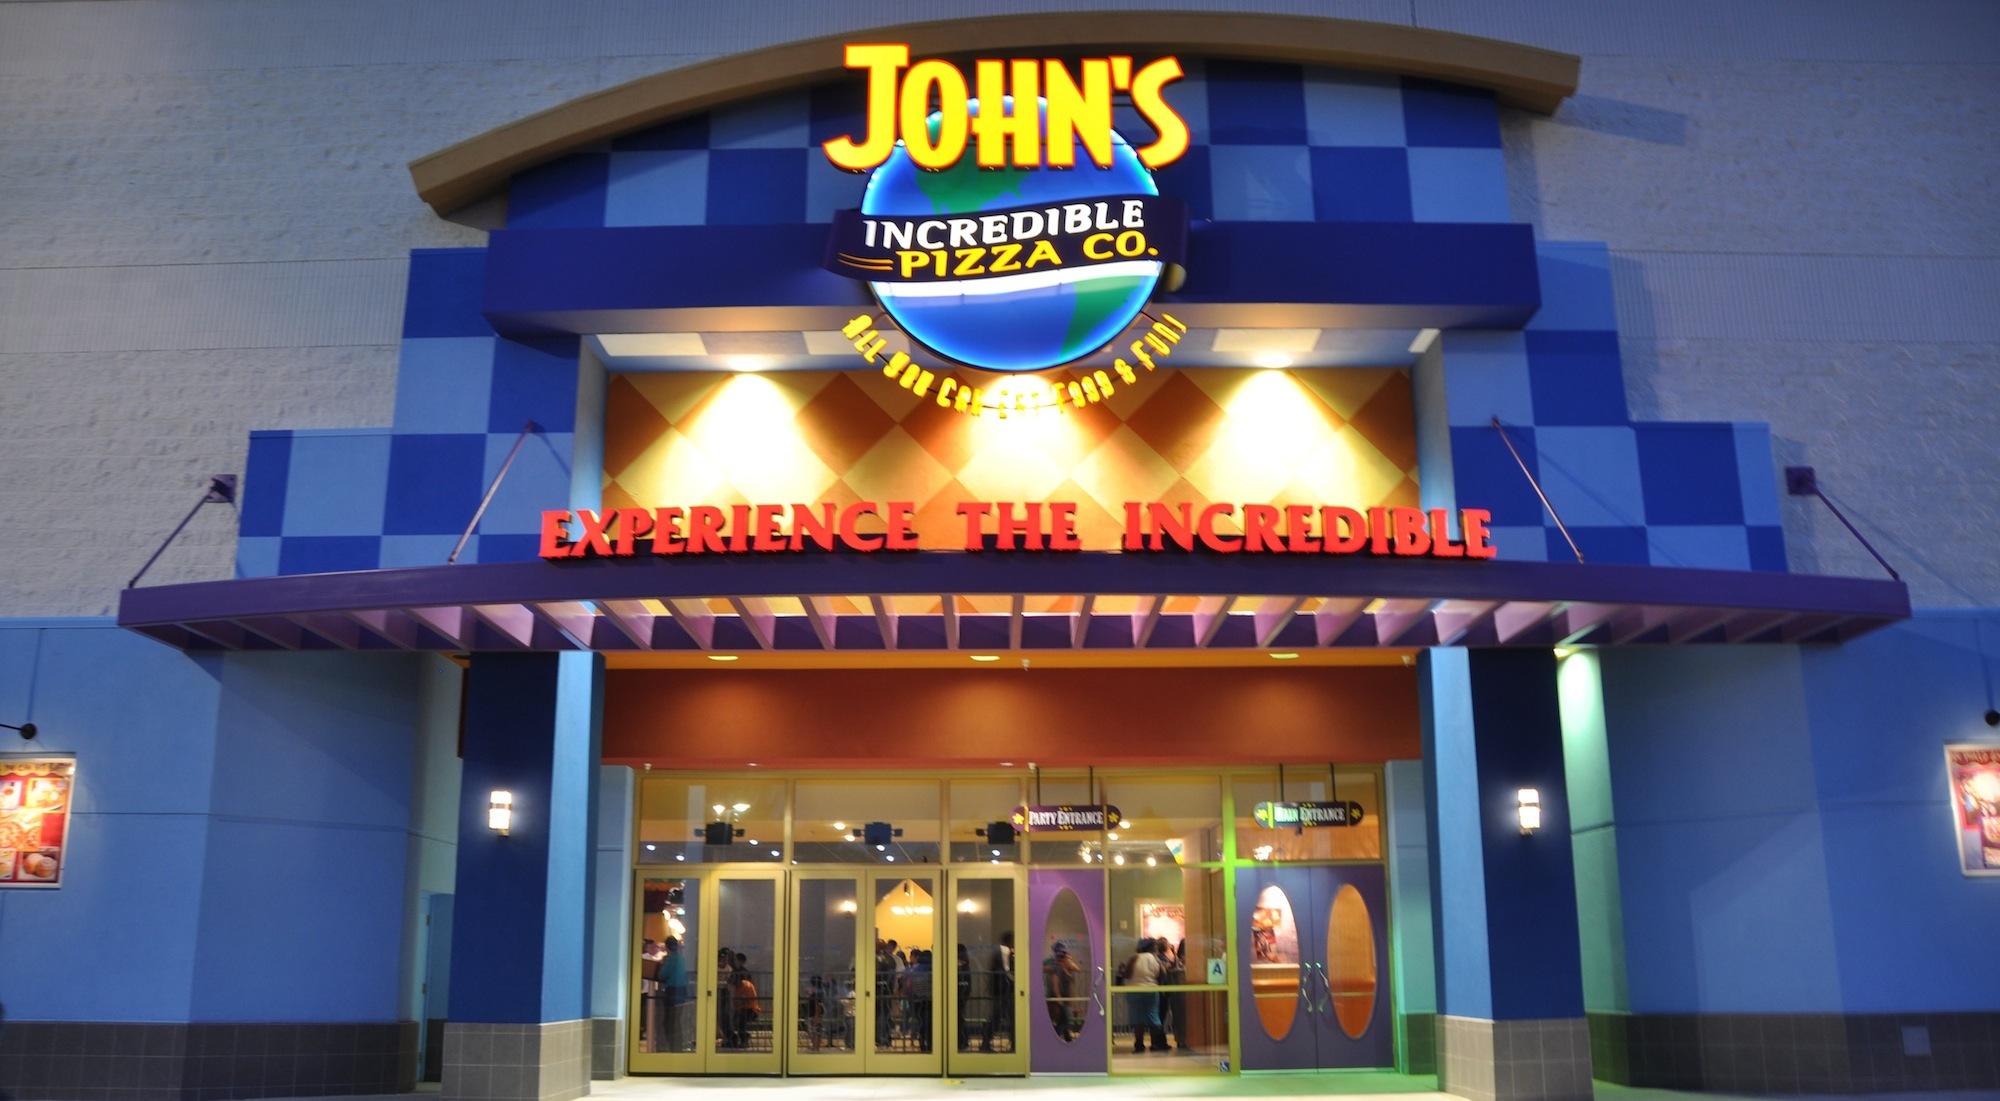 www.johnspizza.com/survey - John's Incredible Pizza Co ...